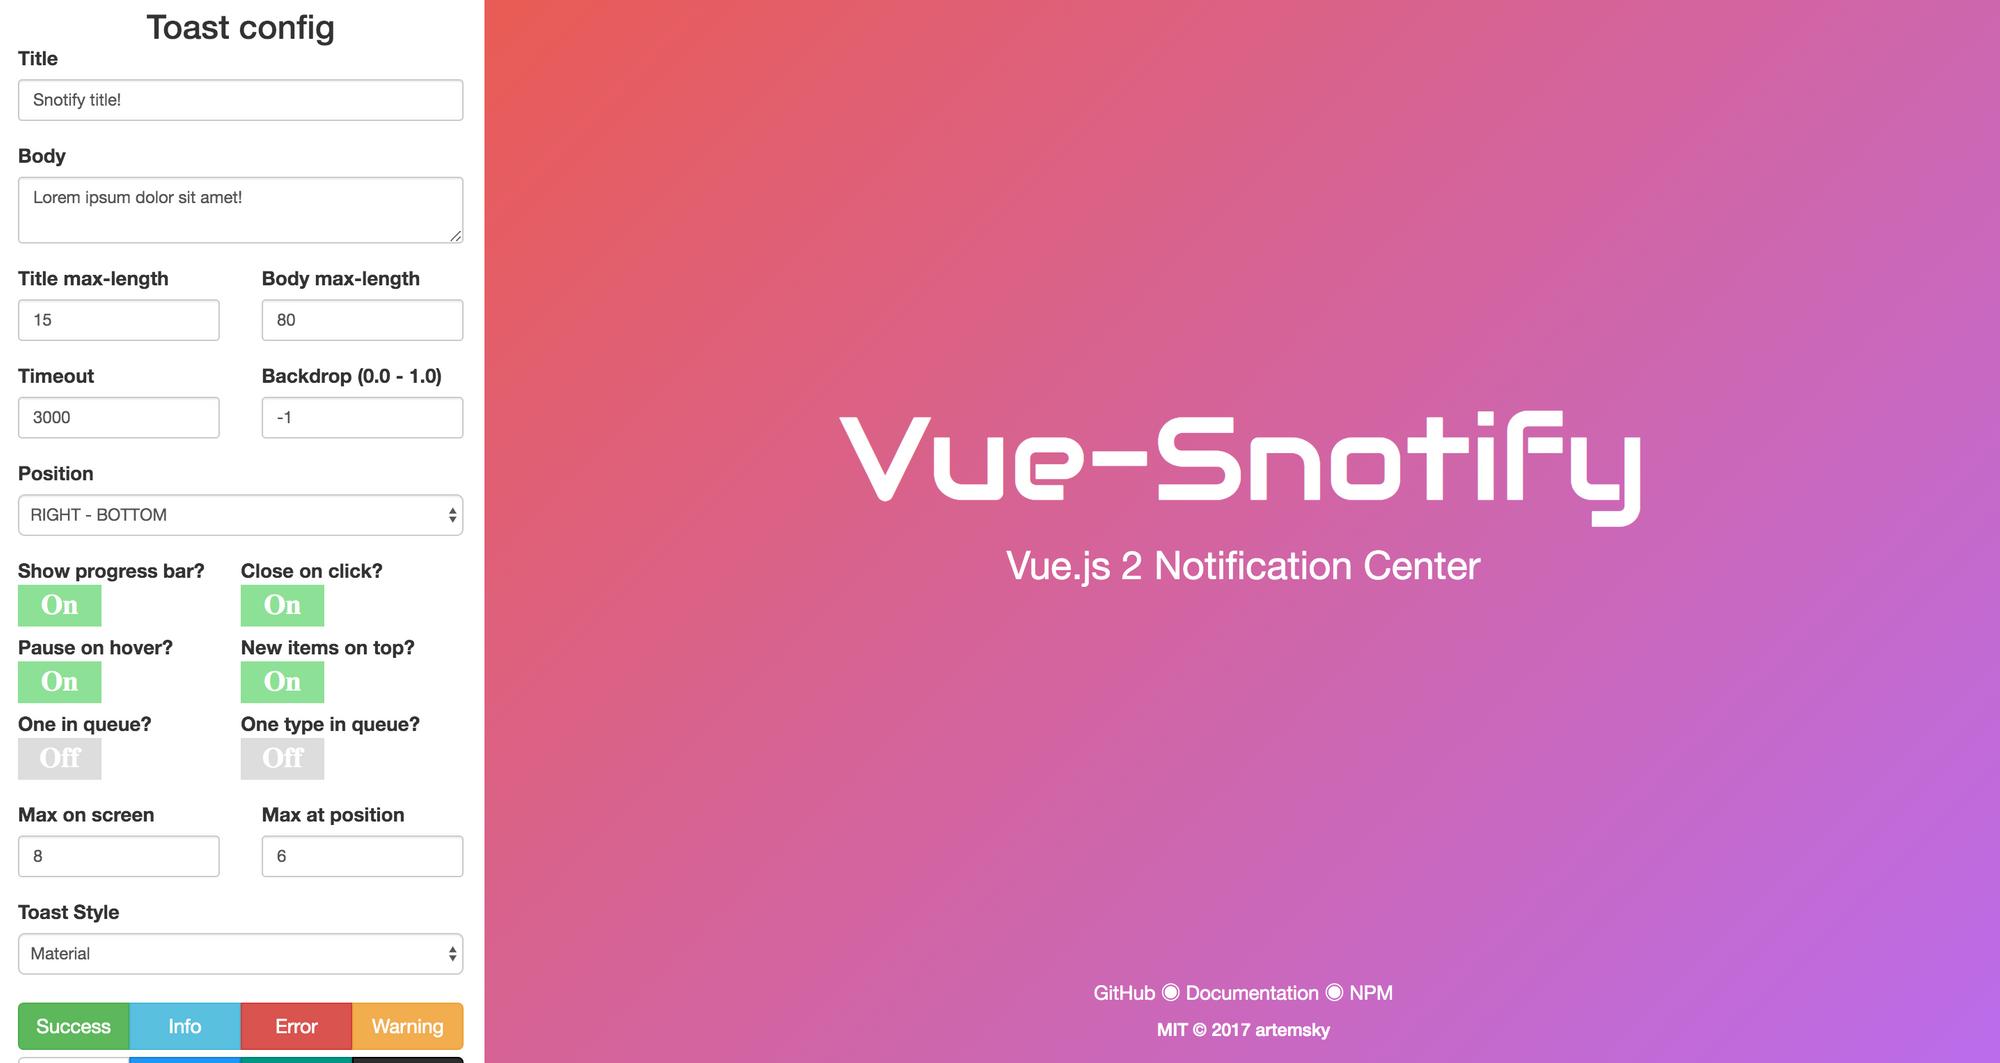 Vue-Snotify - VueJS